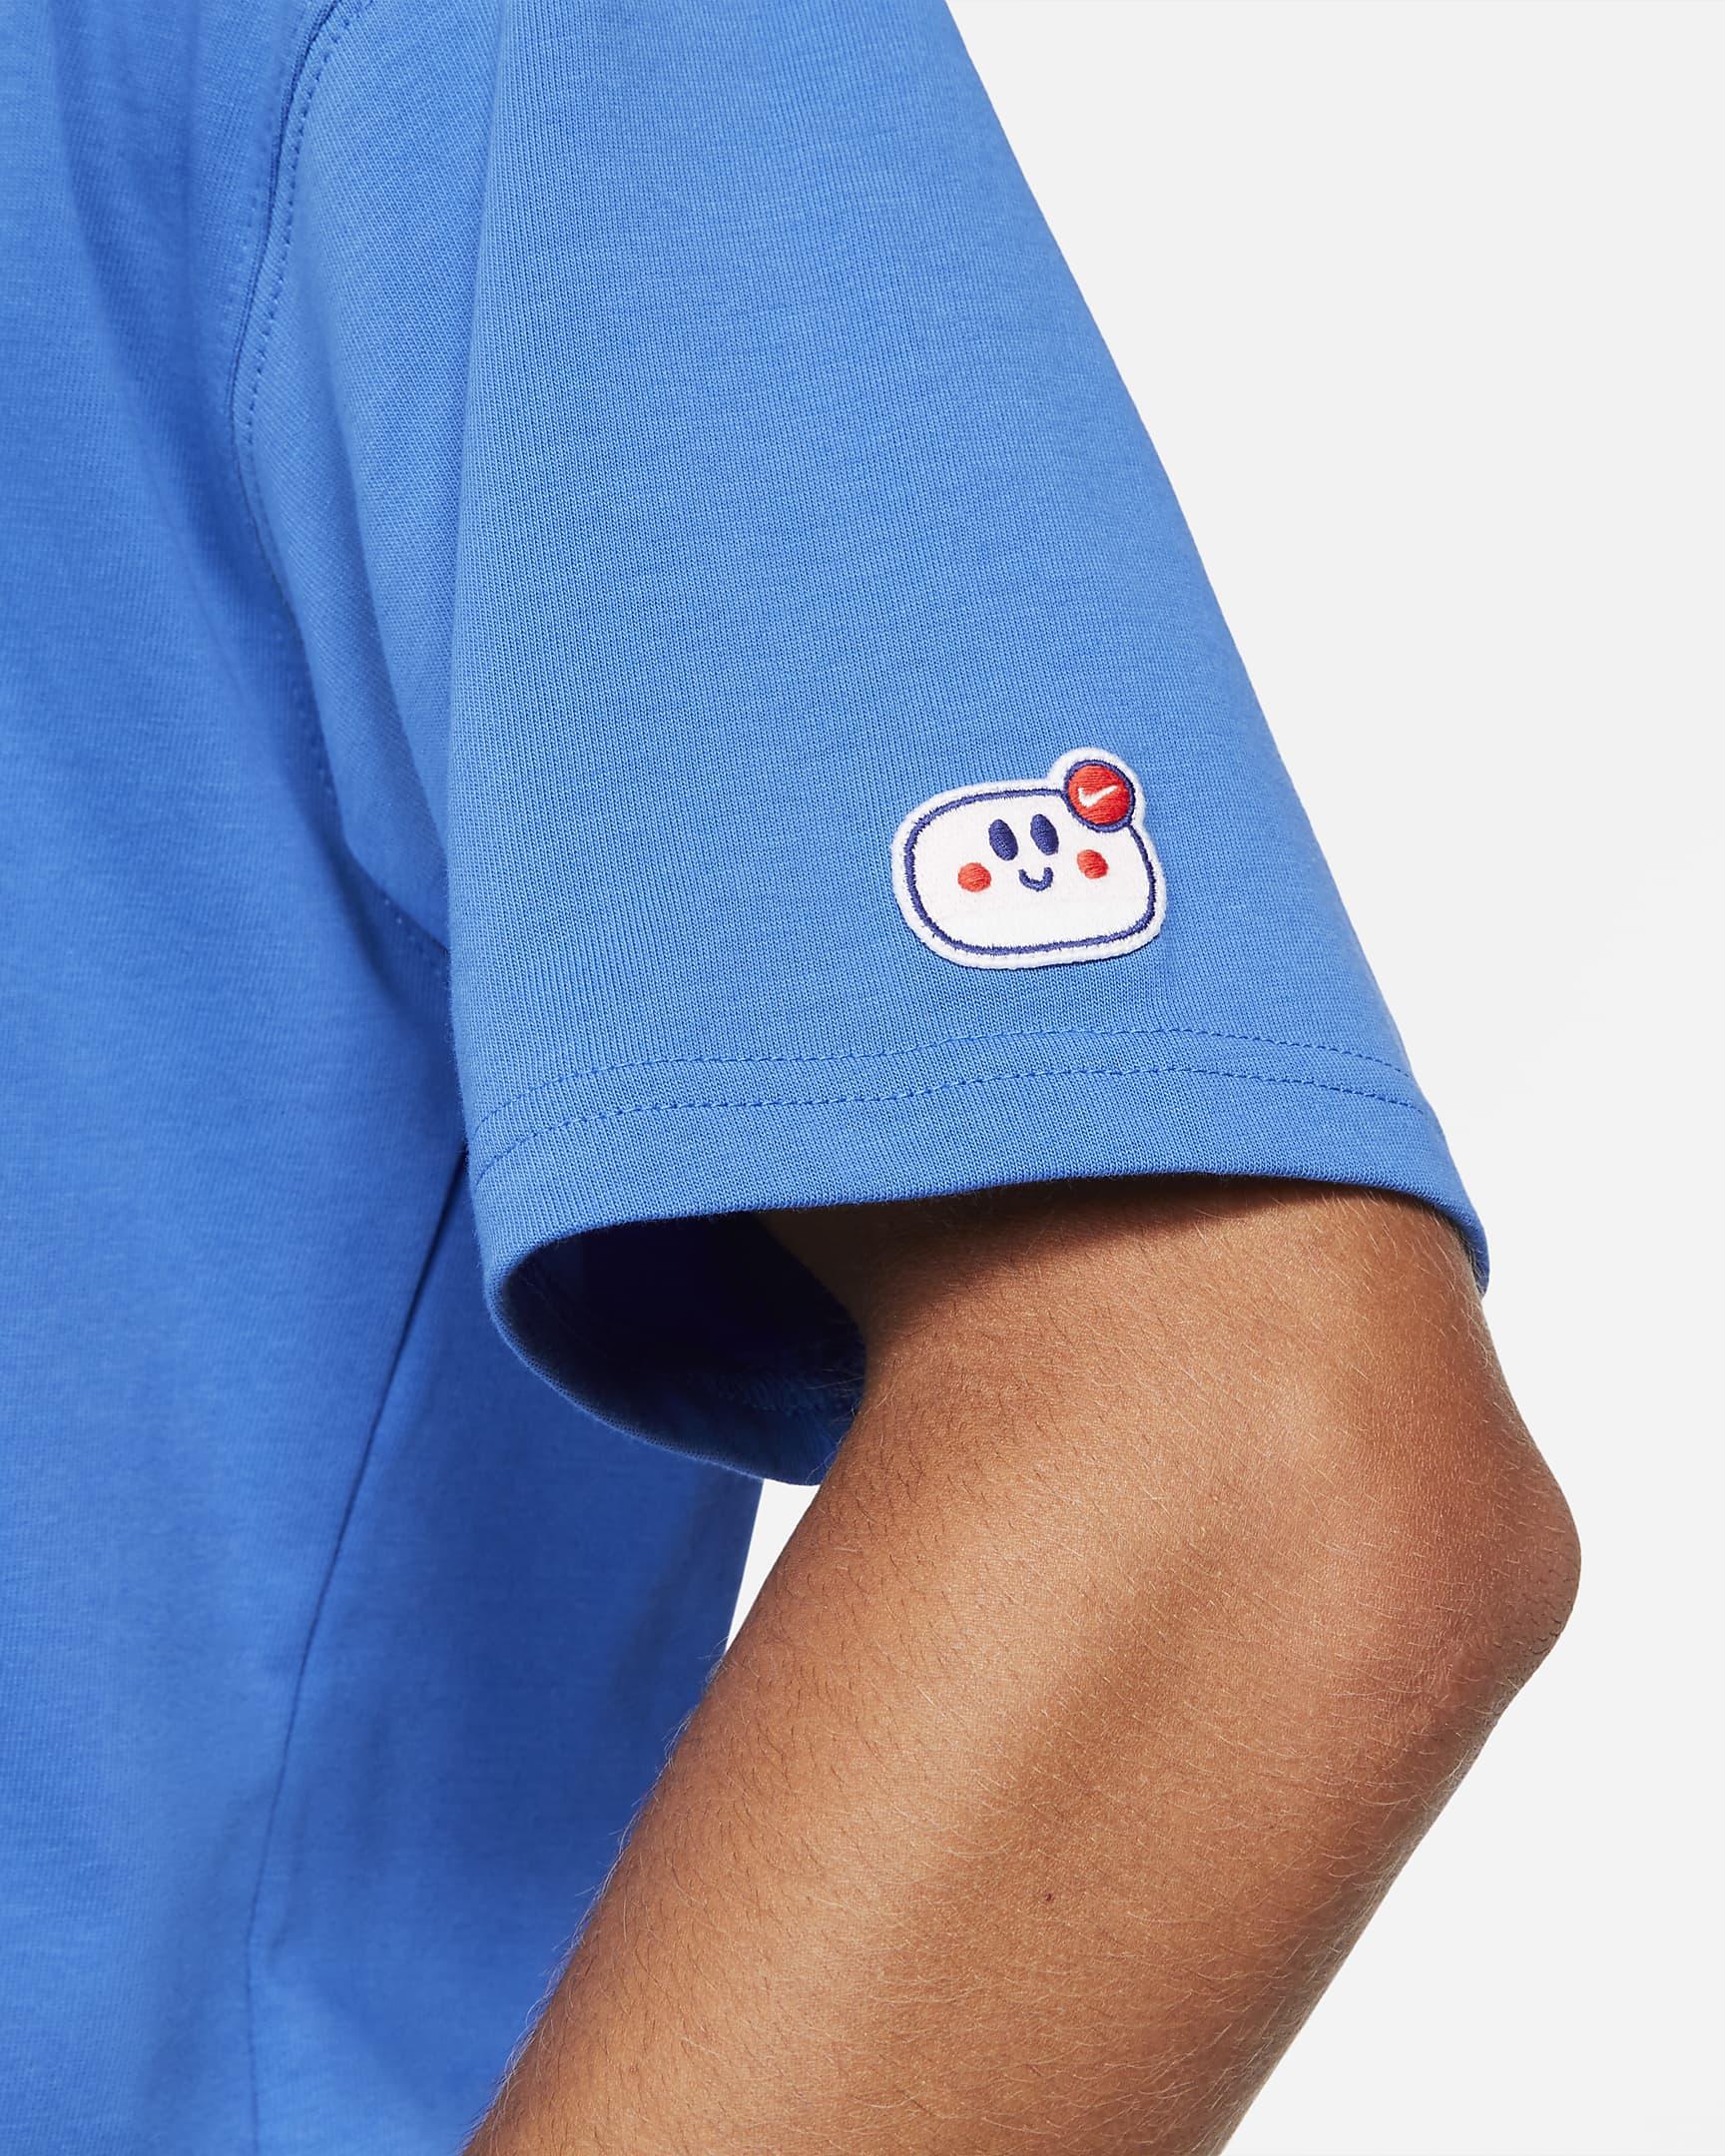 sportswear-mens-t-shirt-NJsP4C-5